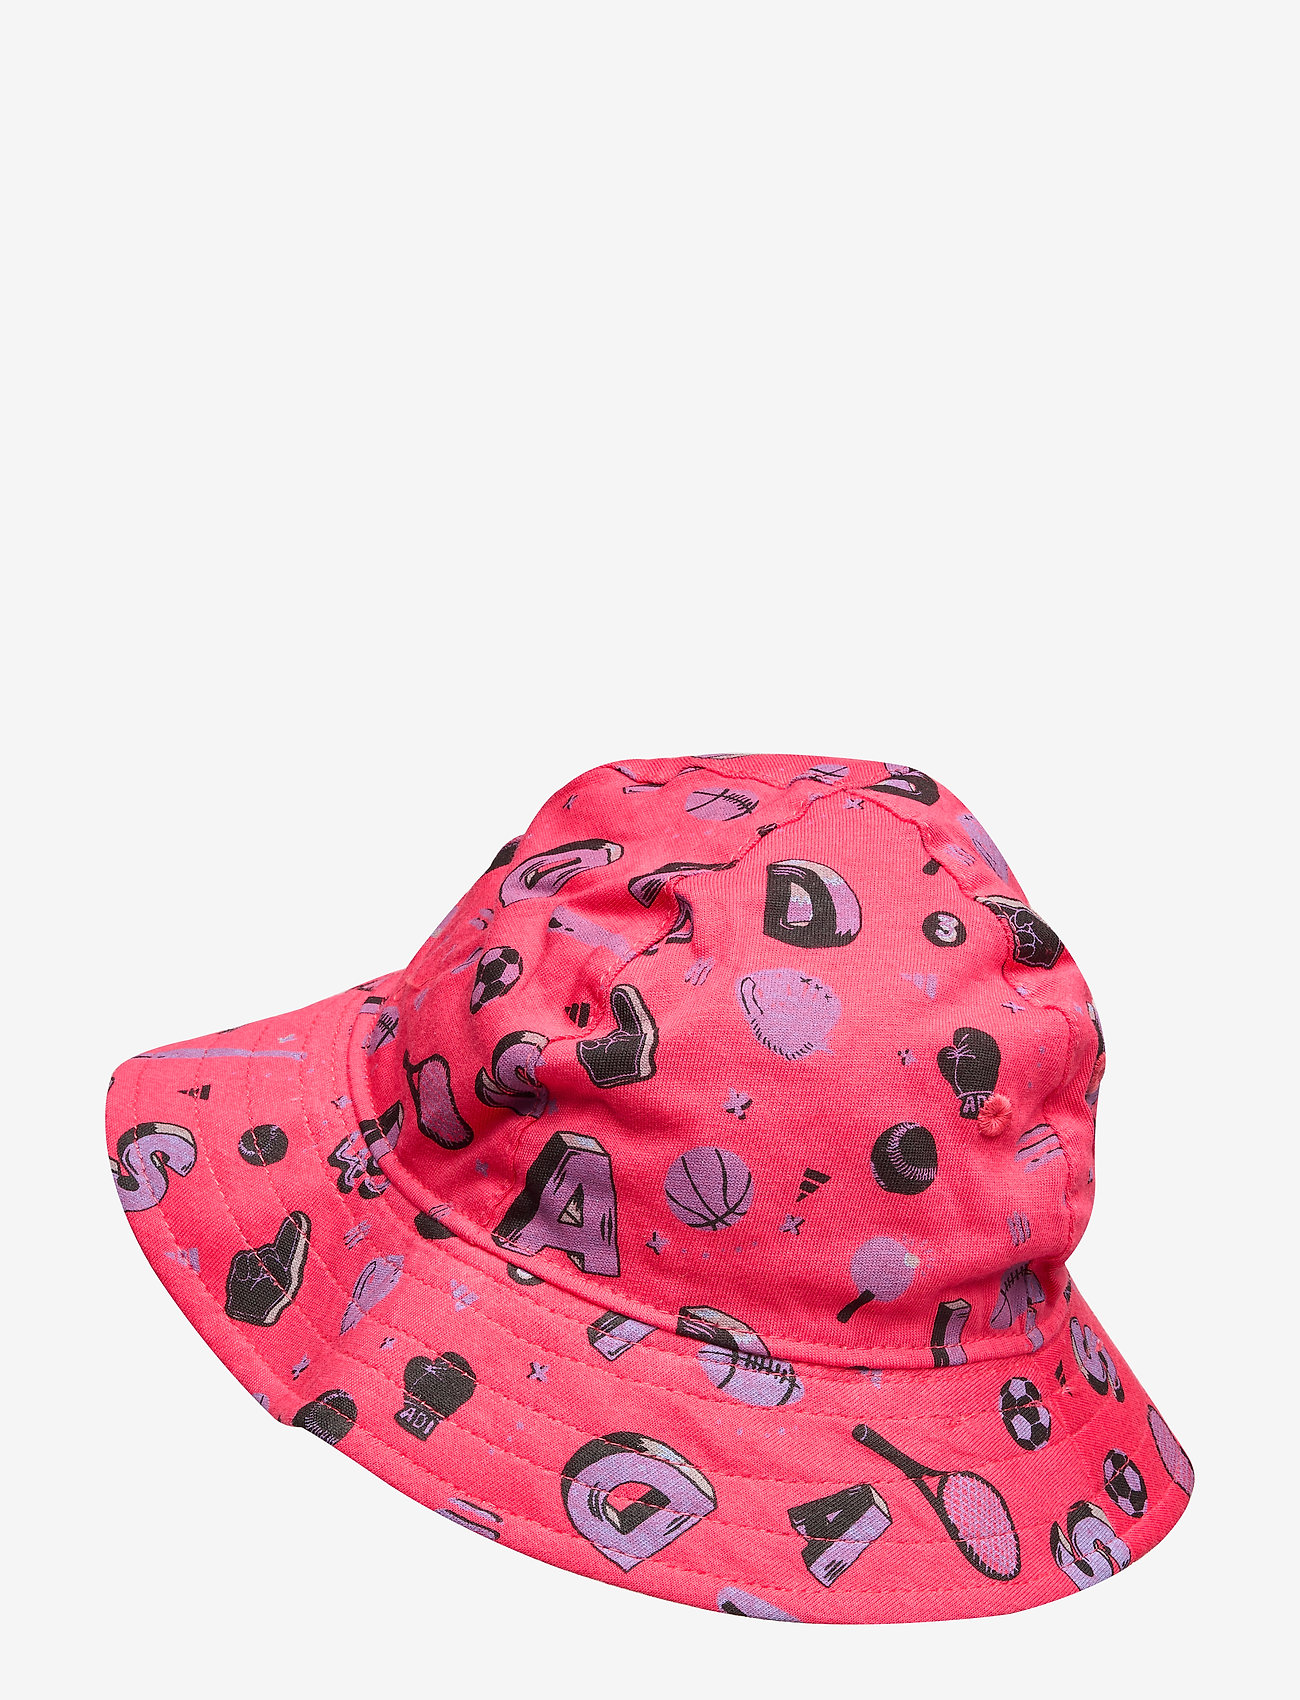 adidas Performance - INF BUCKET HAT - sun hats - corpnk/dshgrn/corpnk - 1